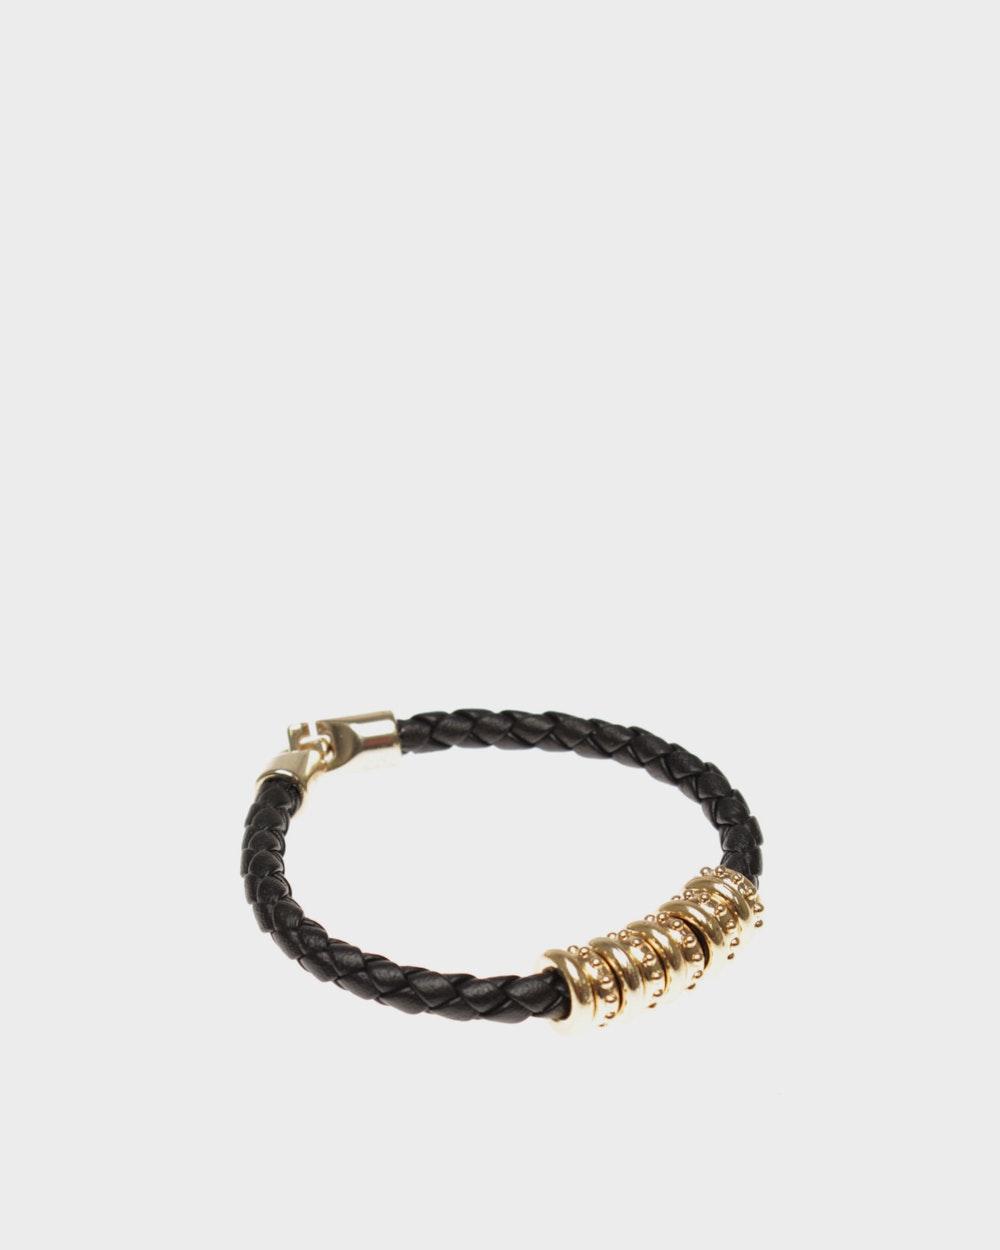 Armband Black Saddler